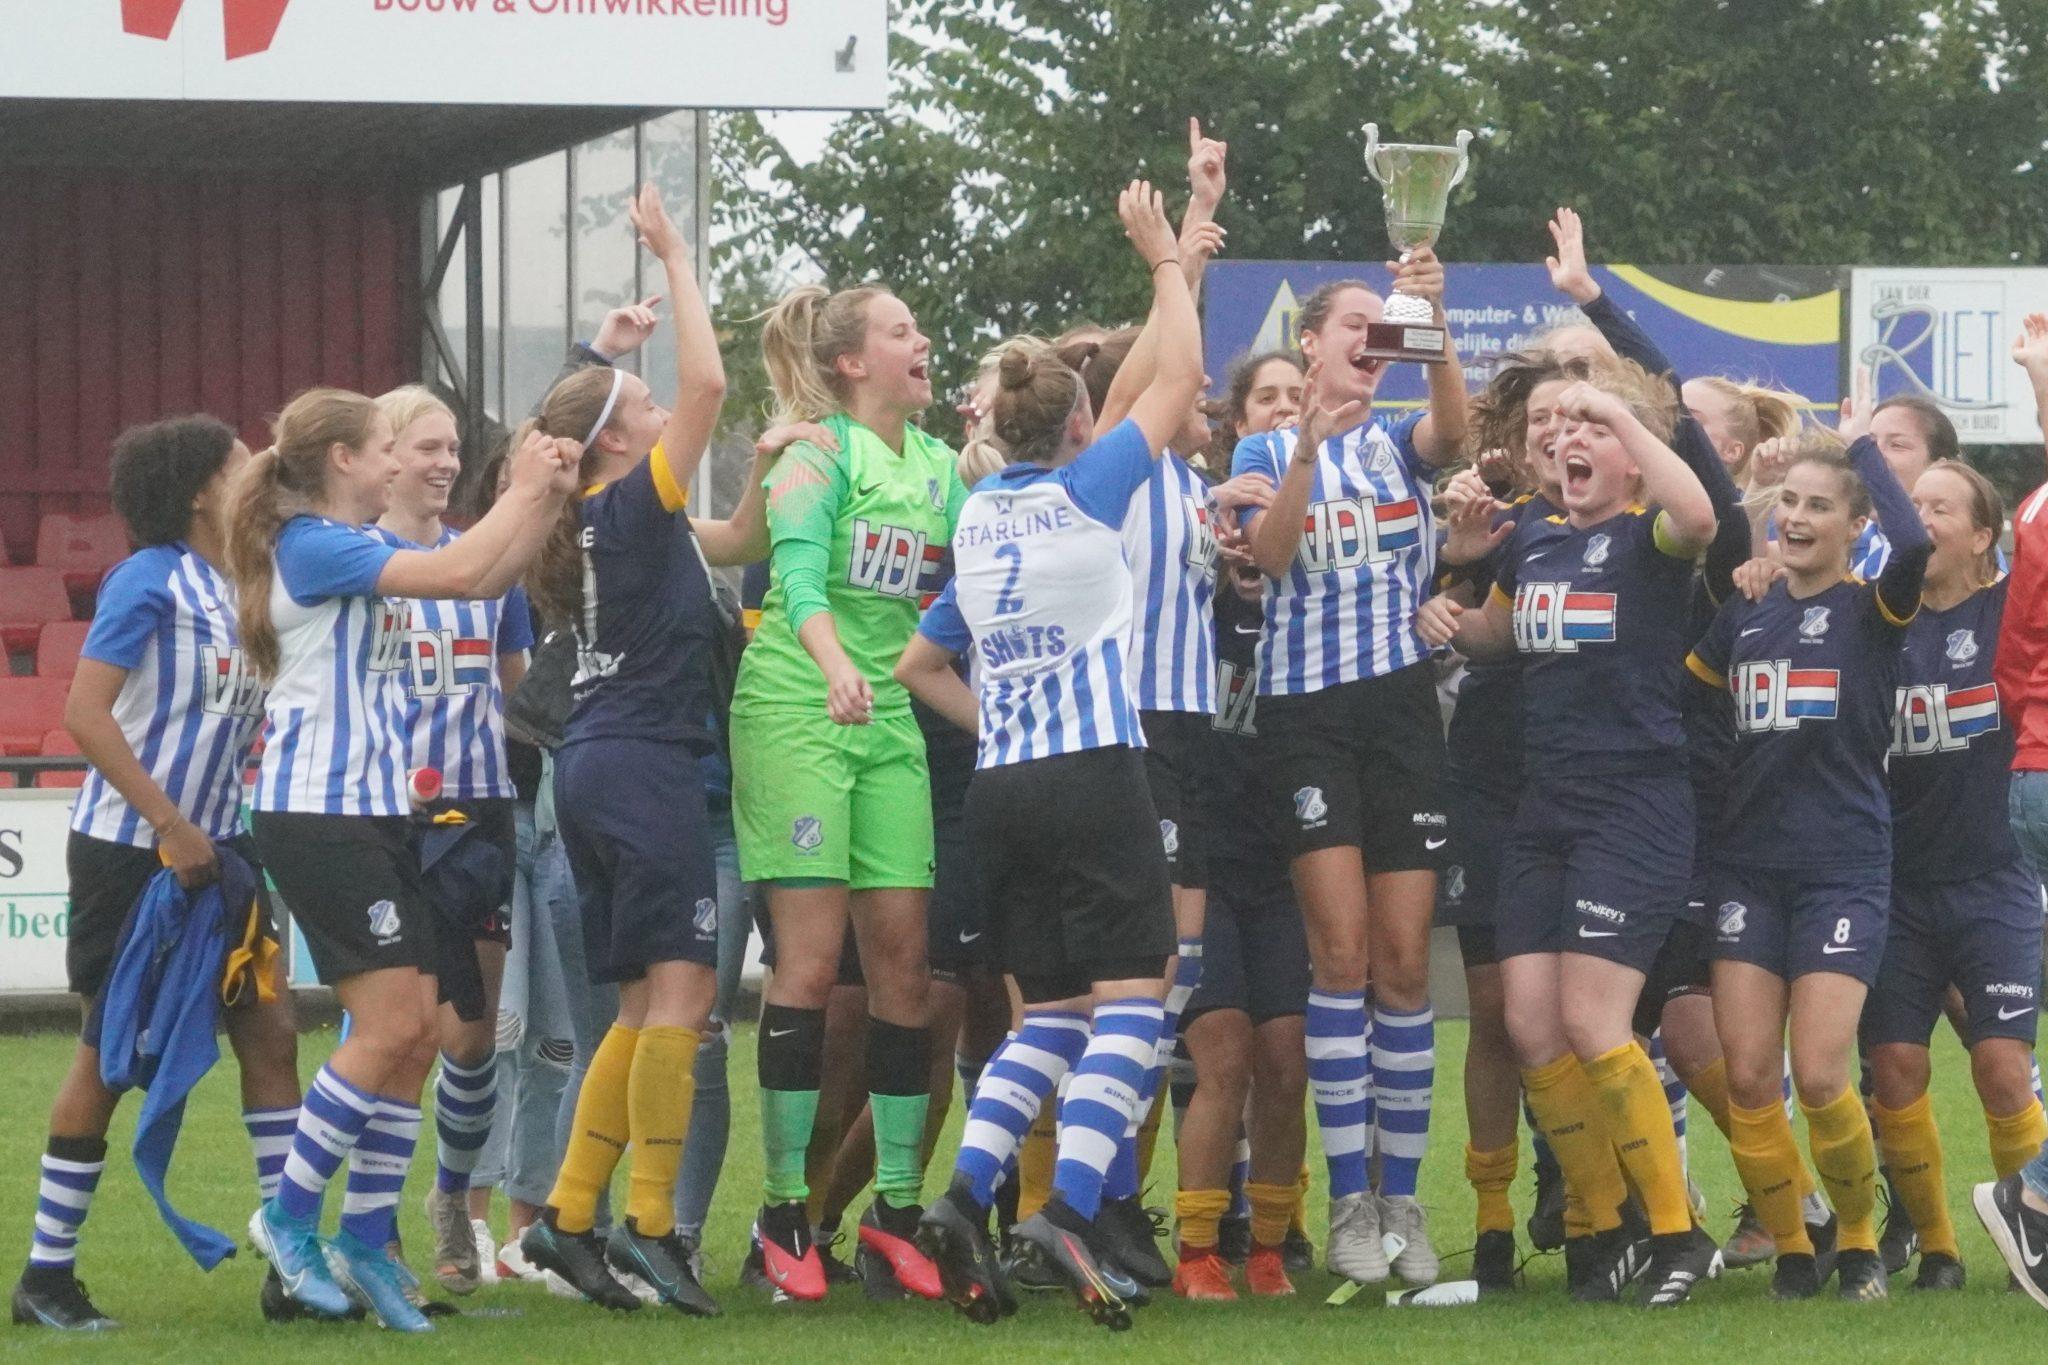 FC Eindhoven wint vrouwentoernooi